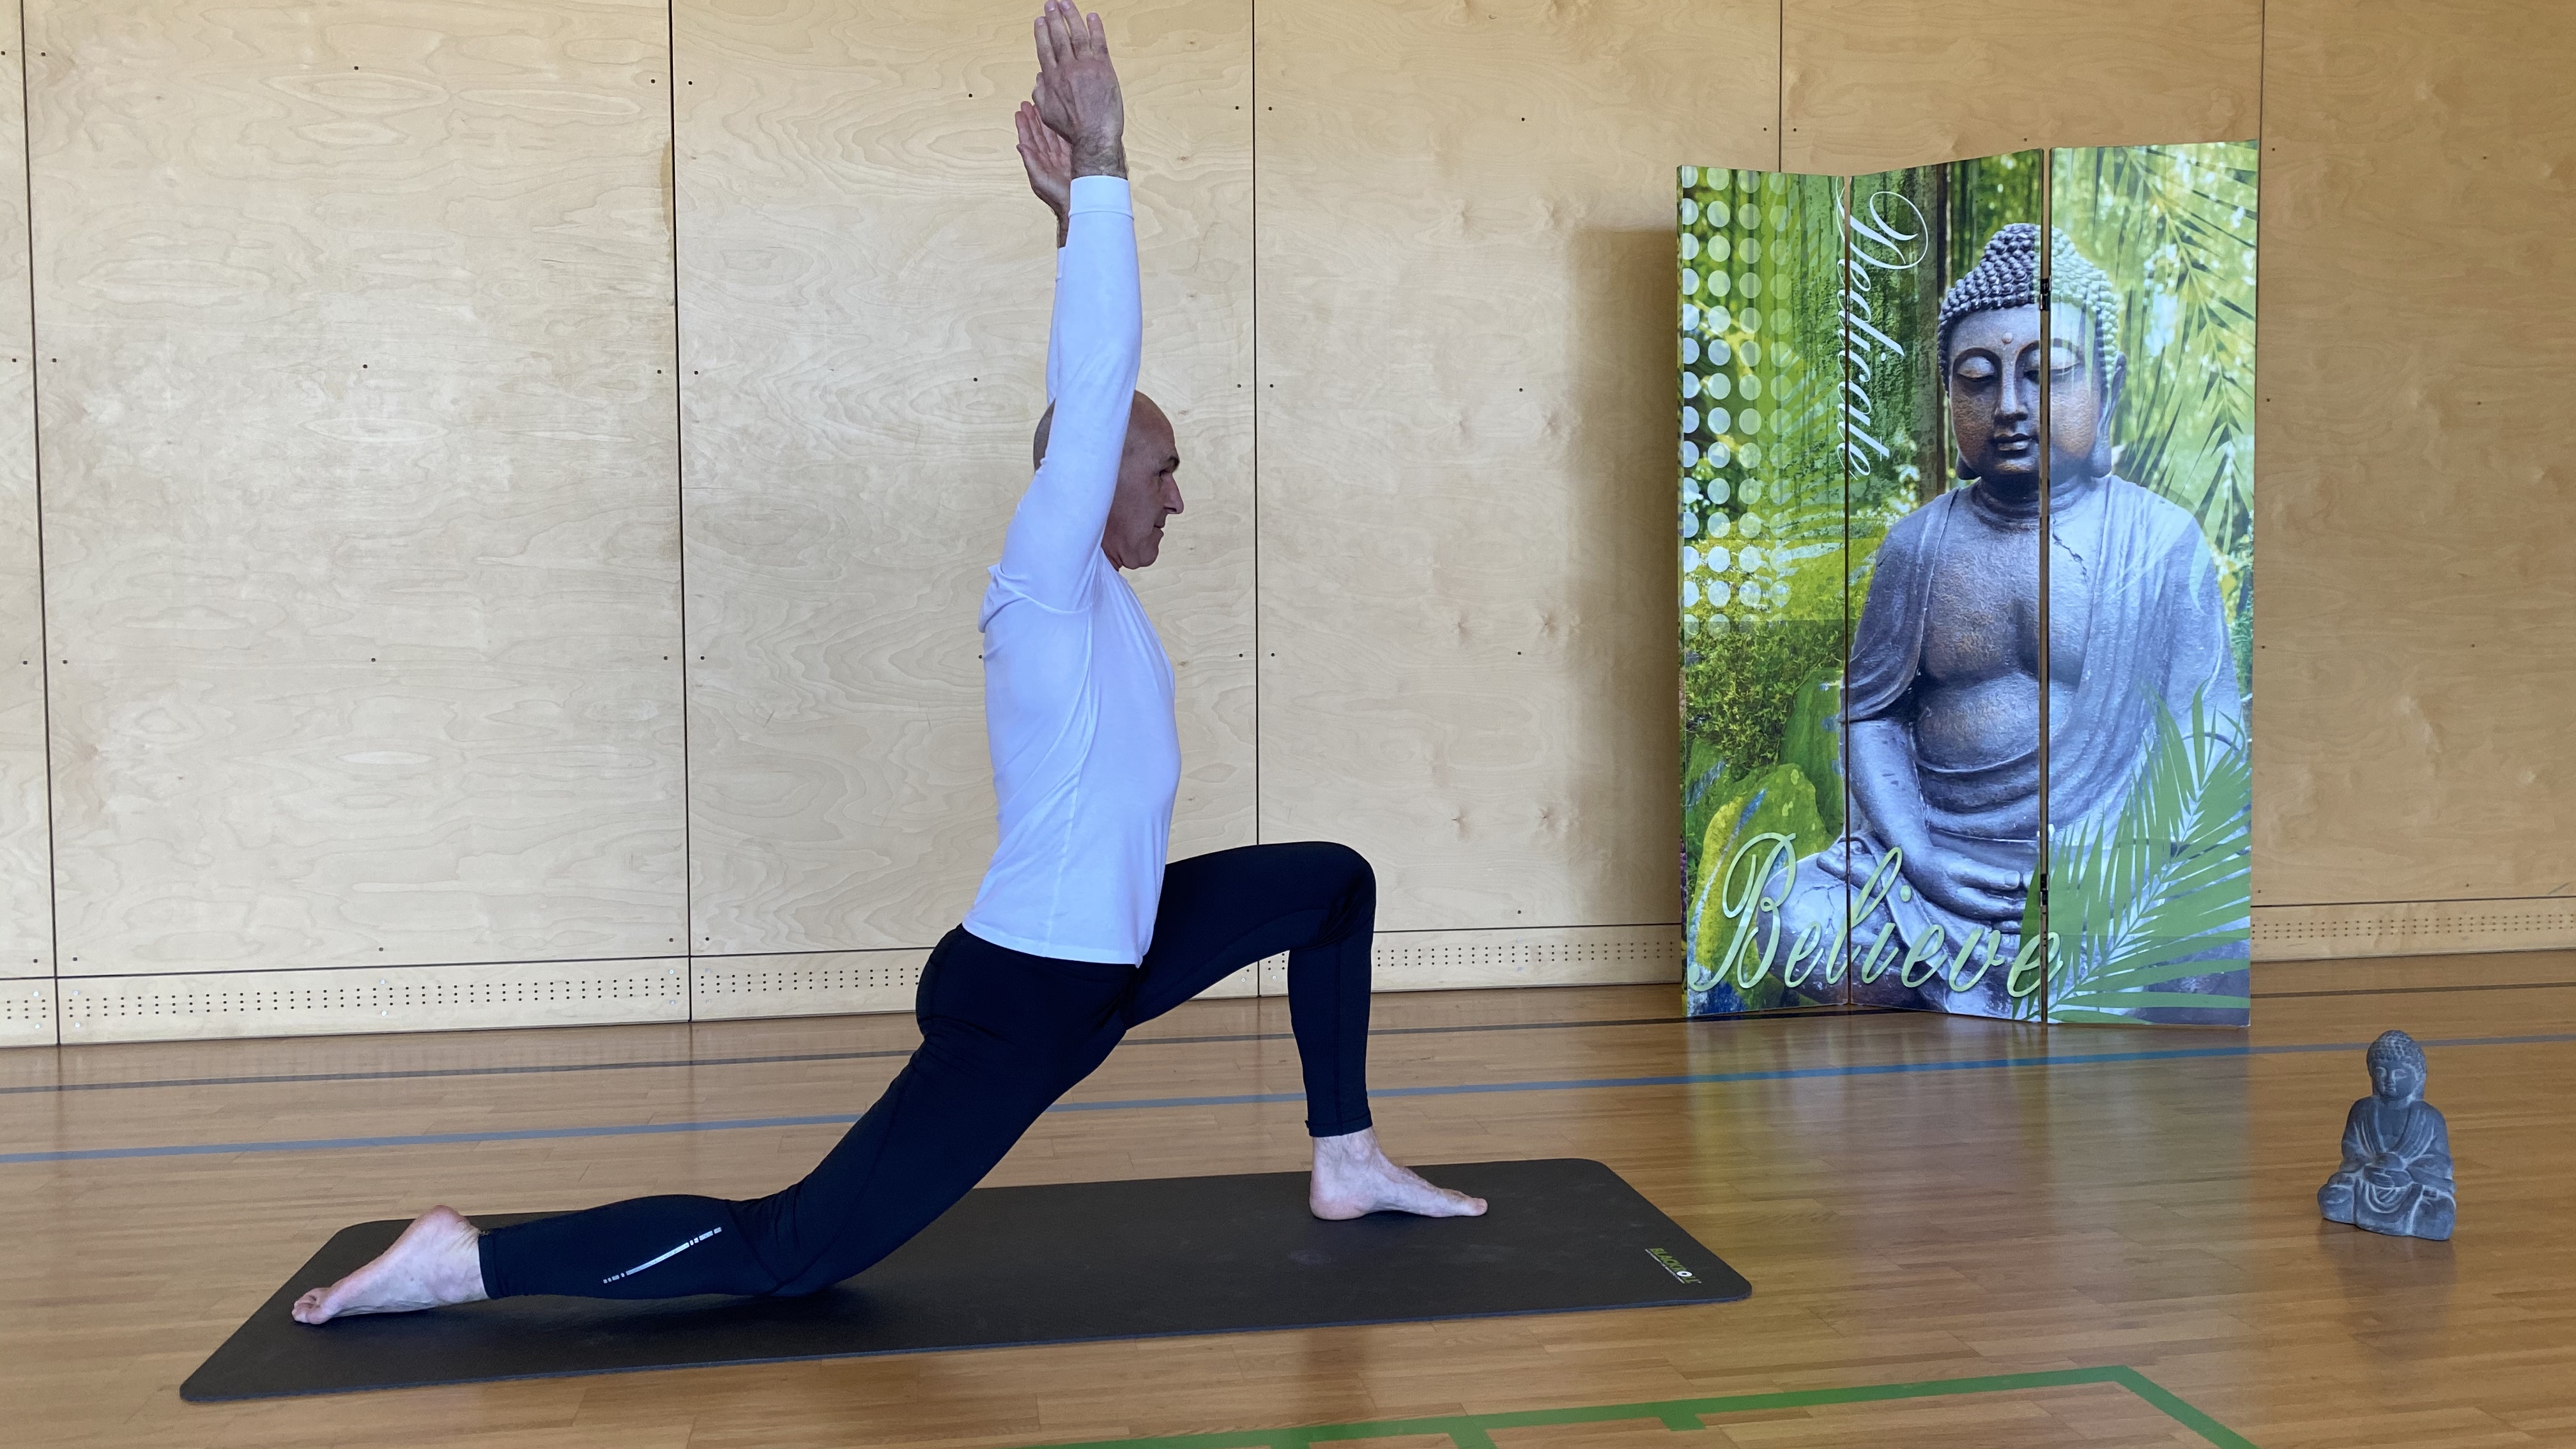 Videokurs: Namaste Yoga – Entspannte Yogaflows für den aktiven Lifestyle!